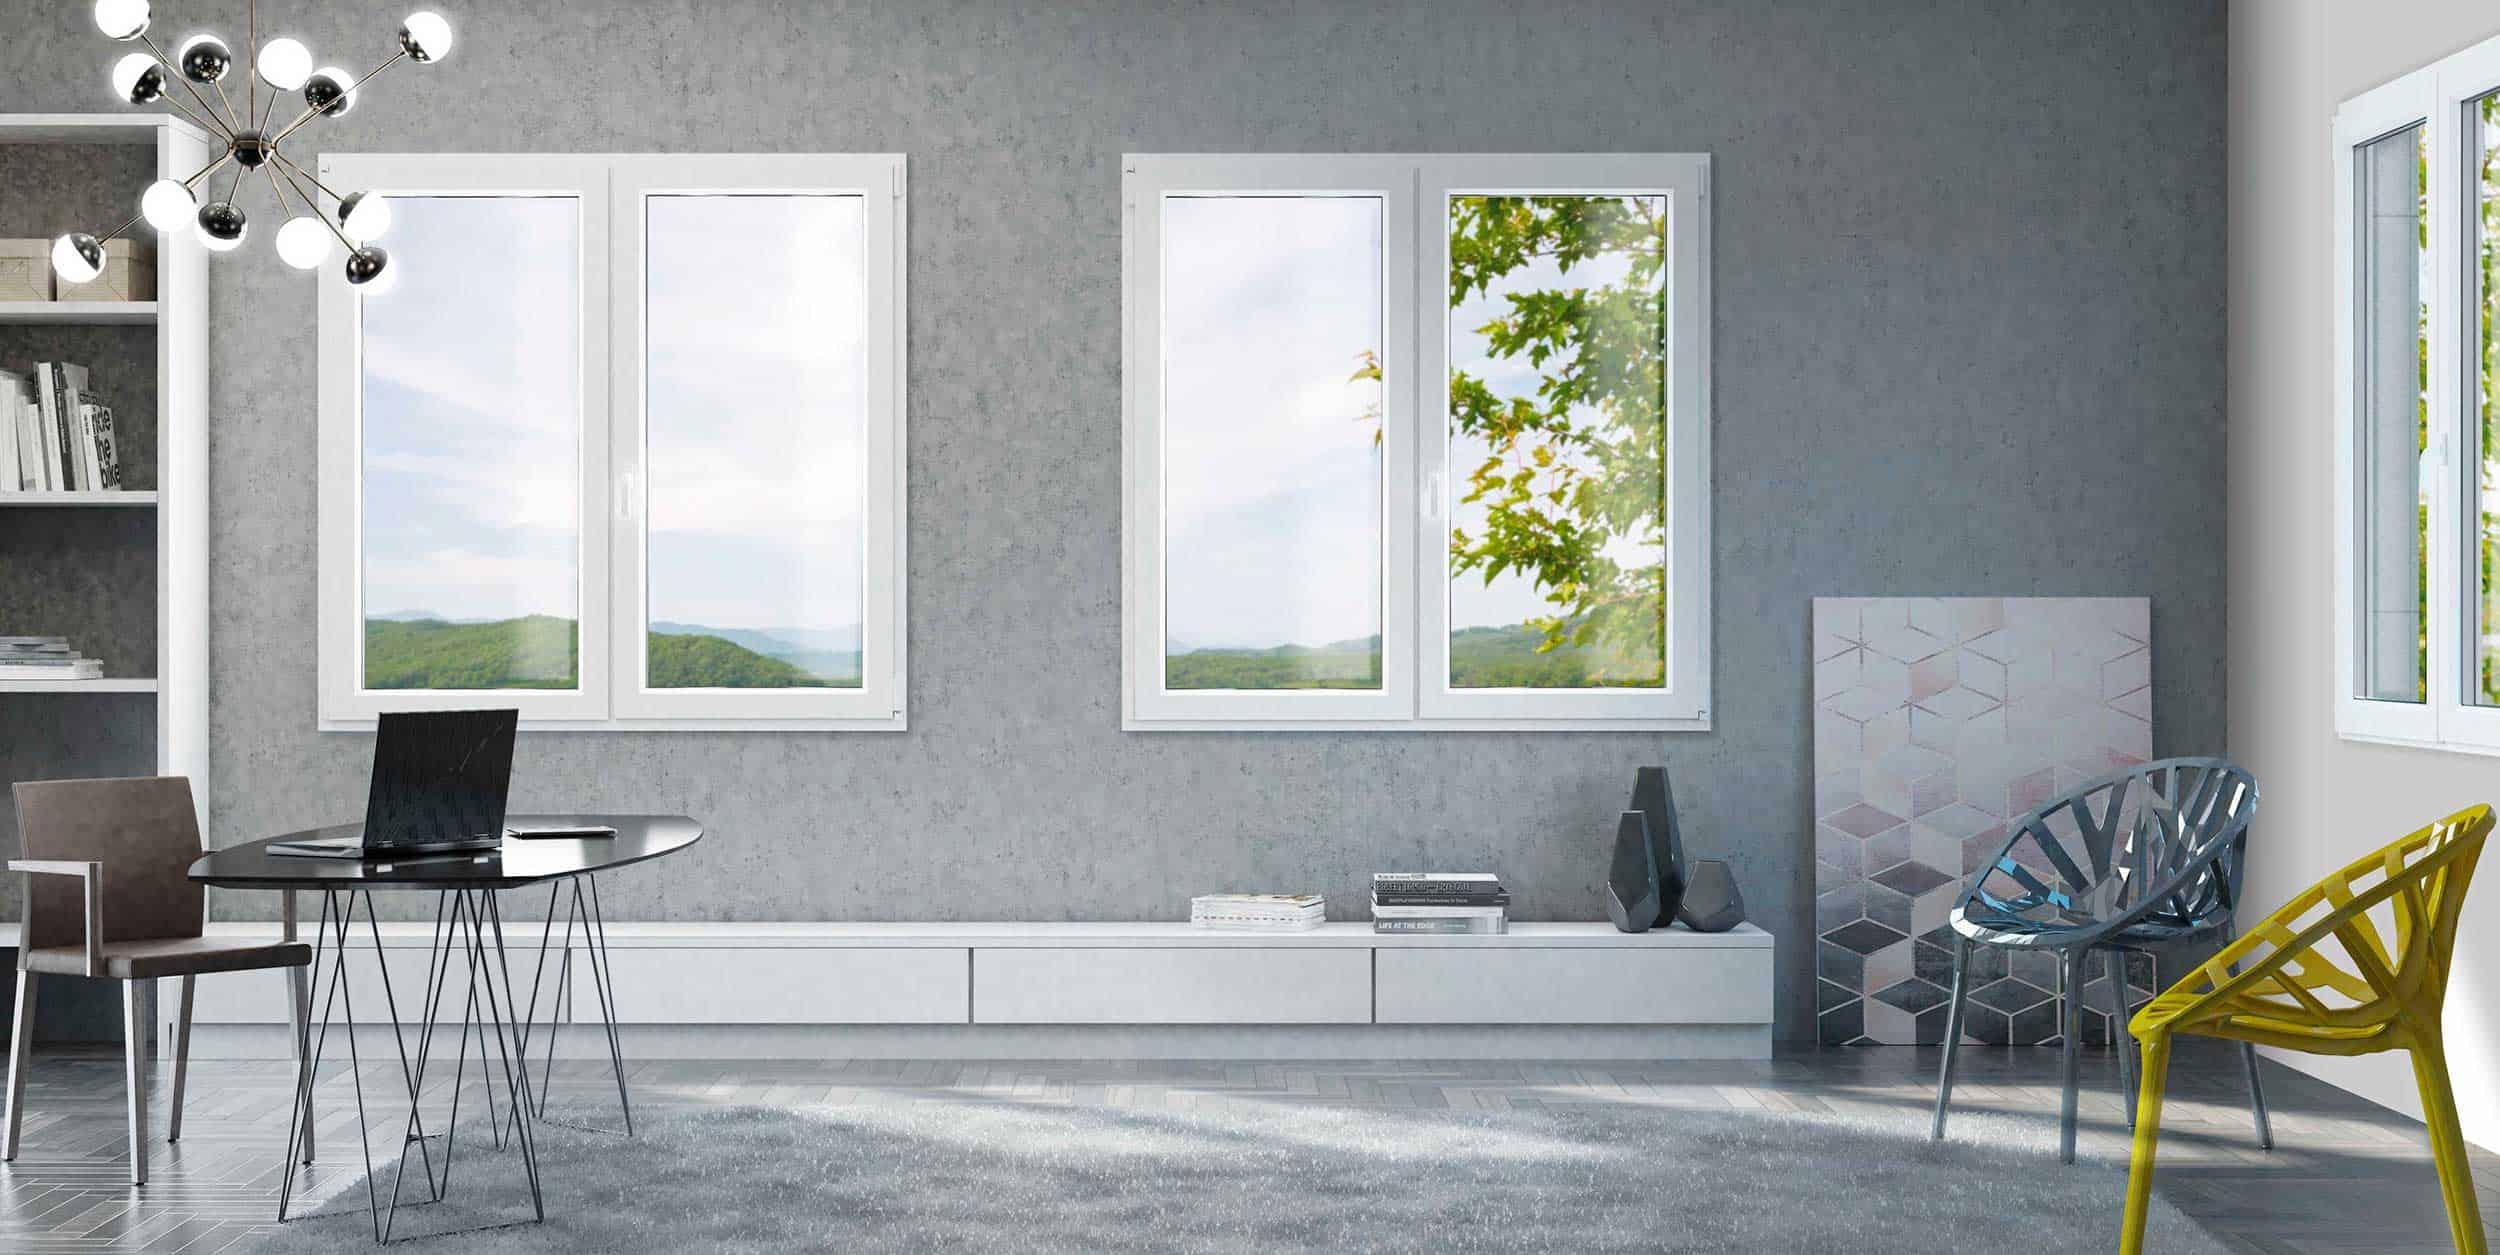 Finestre-PVC-3M-Tecnofer-rendering-3d-padova